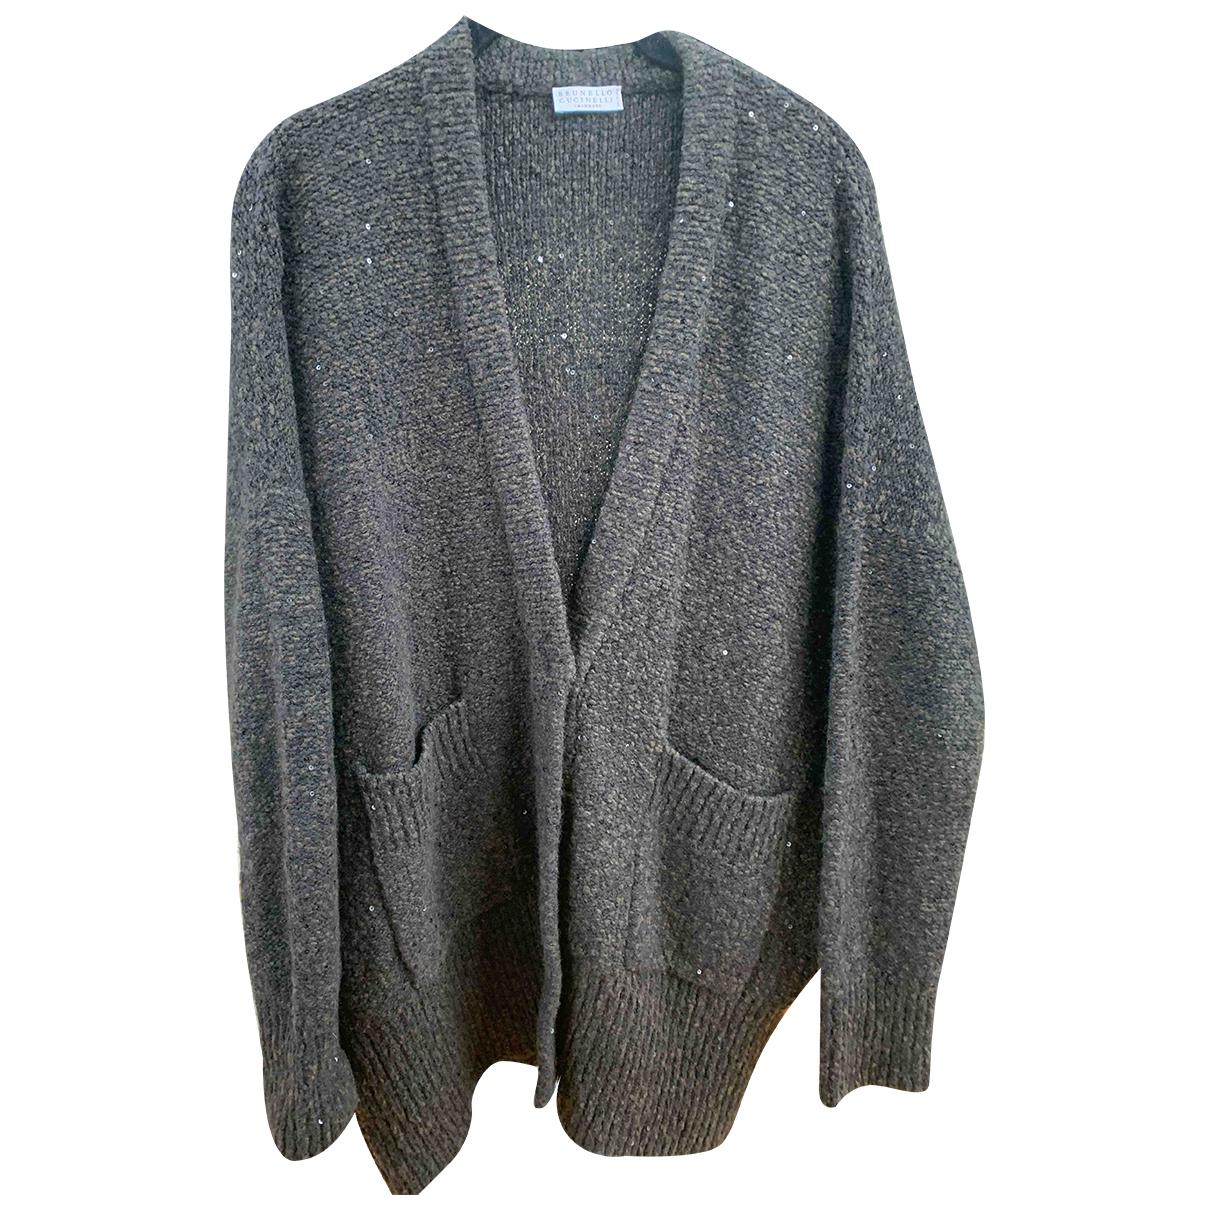 Brunello Cucinelli N Brown Cashmere Knitwear for Women S International